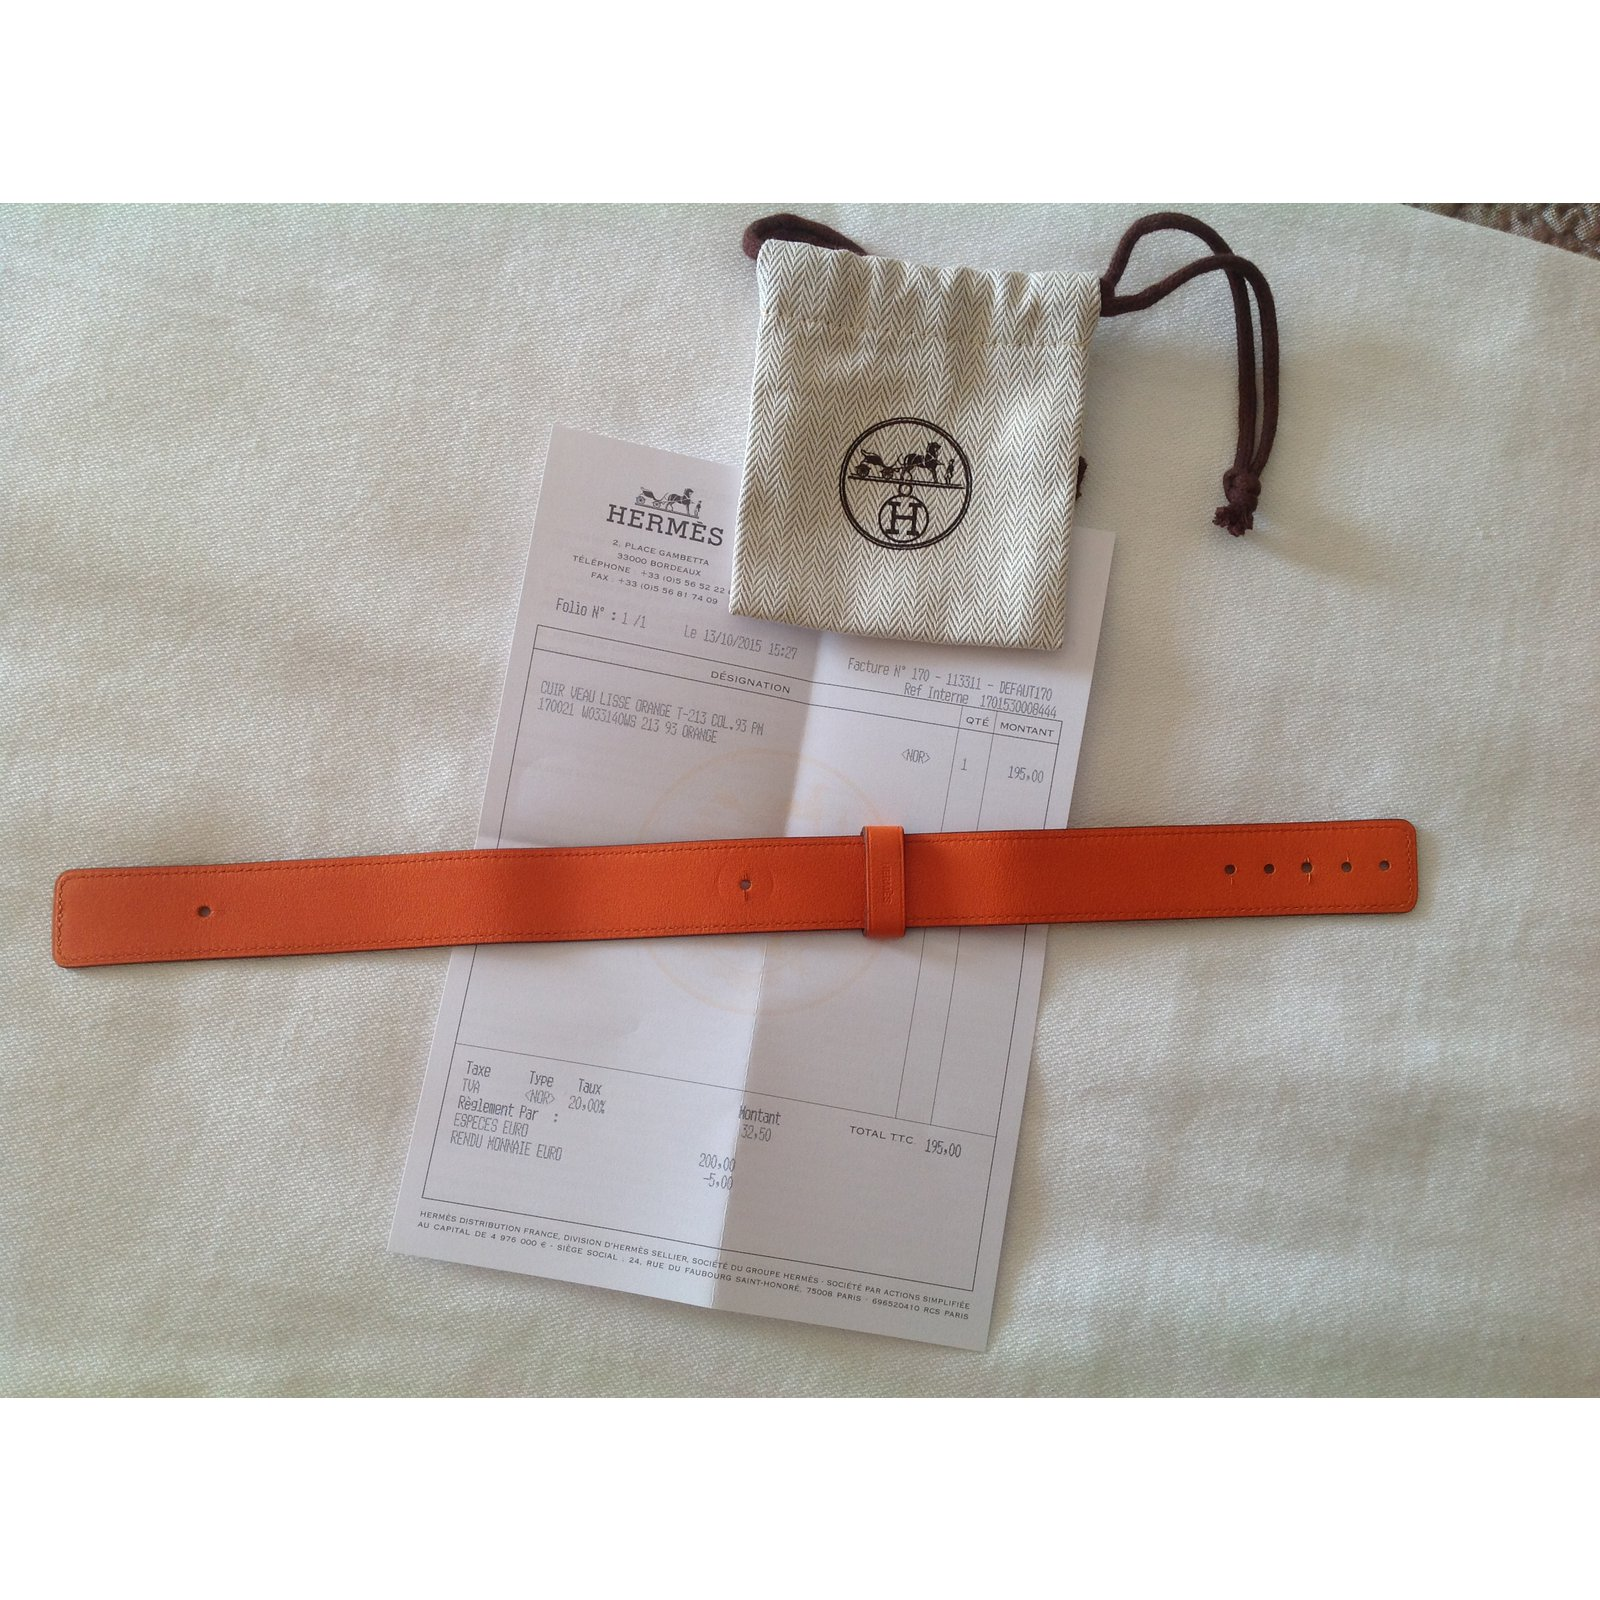 e3154fc300 Bracelets Hermès Bracelet montre Barenia Cuir Orange ref.12774 , Joli  Closet ...